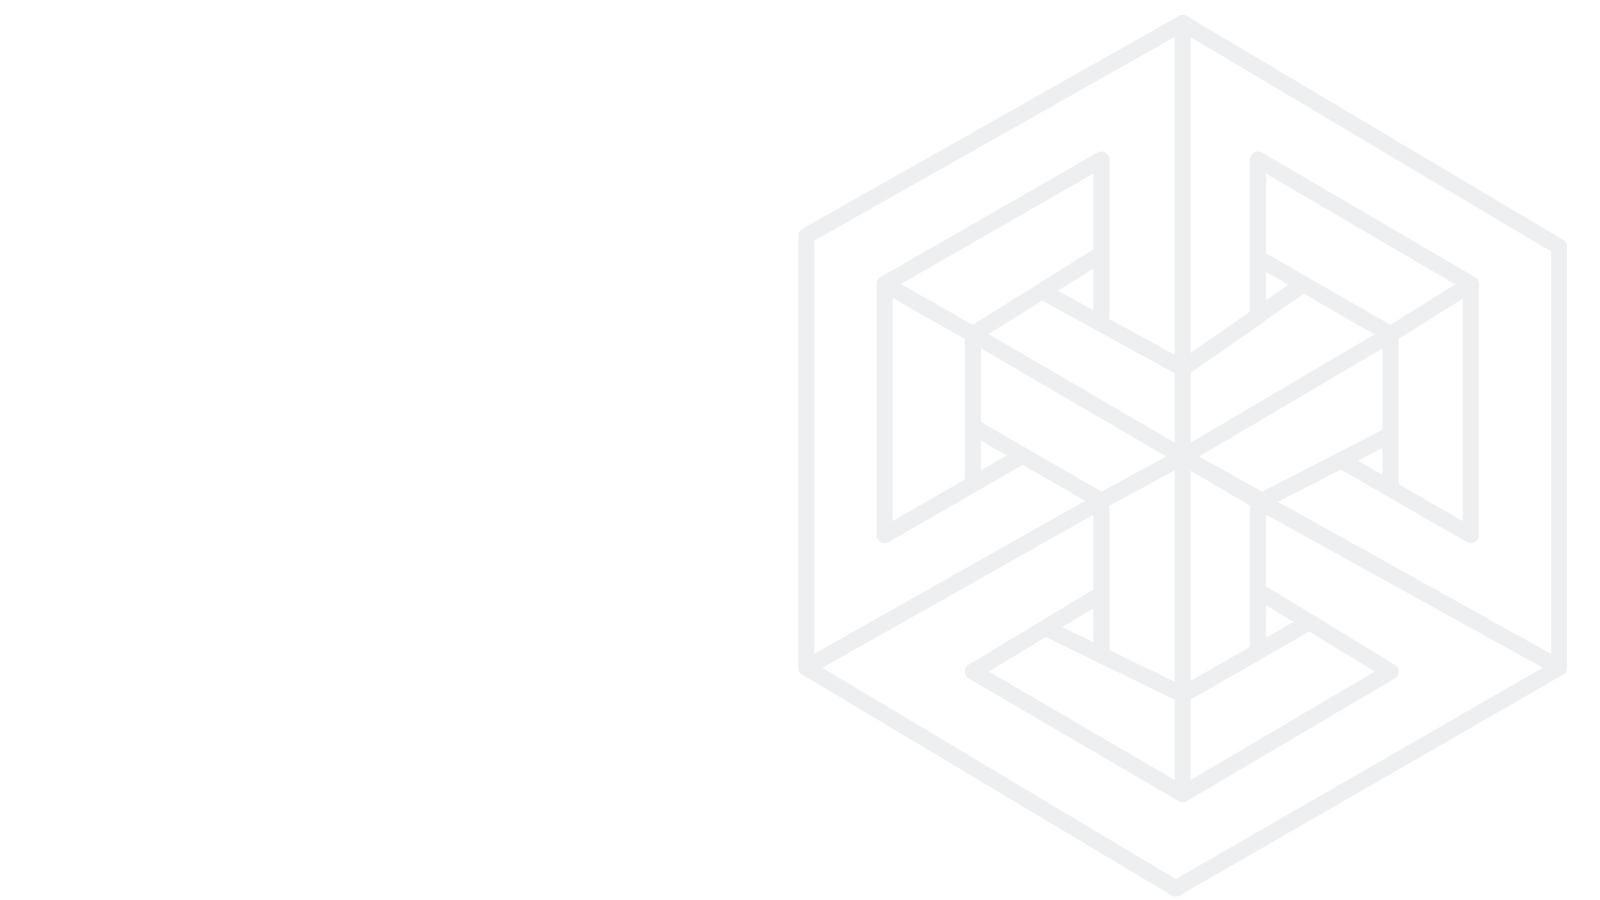 Brandox brand asset portal login background image